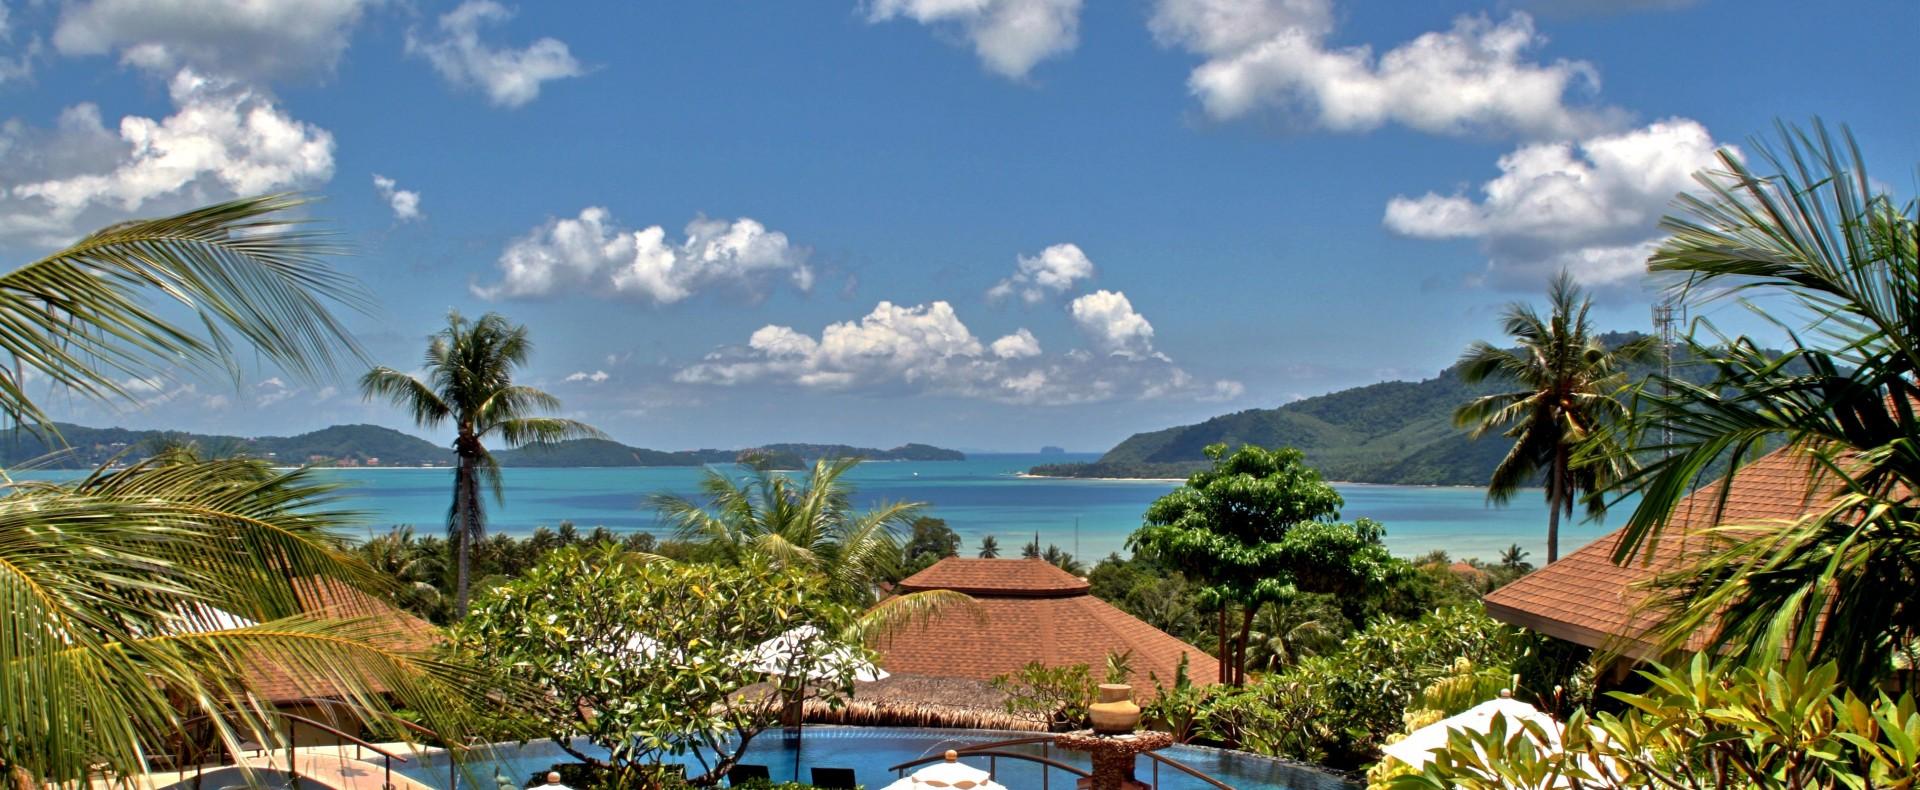 Phuket Resorts, Mangosteen, http://www.mangosteen-phuket.com